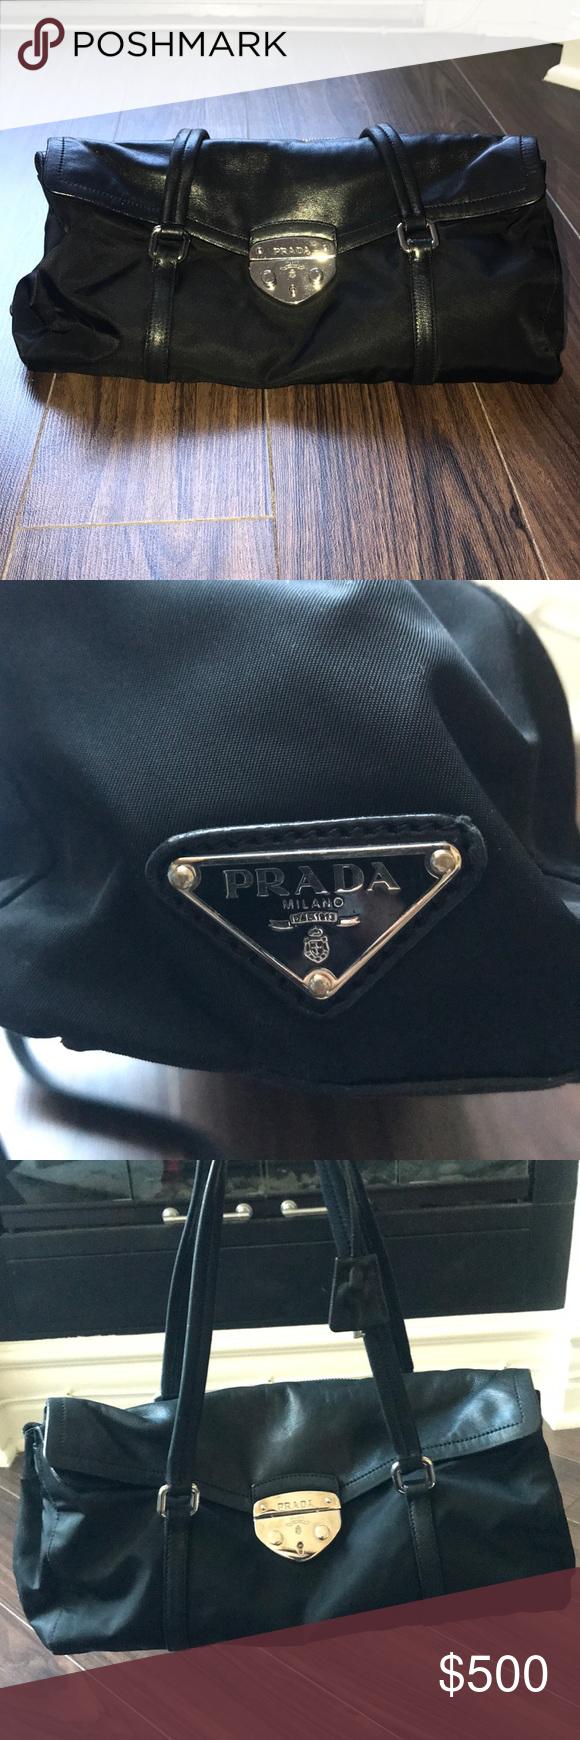 Photo of Prada Handbag